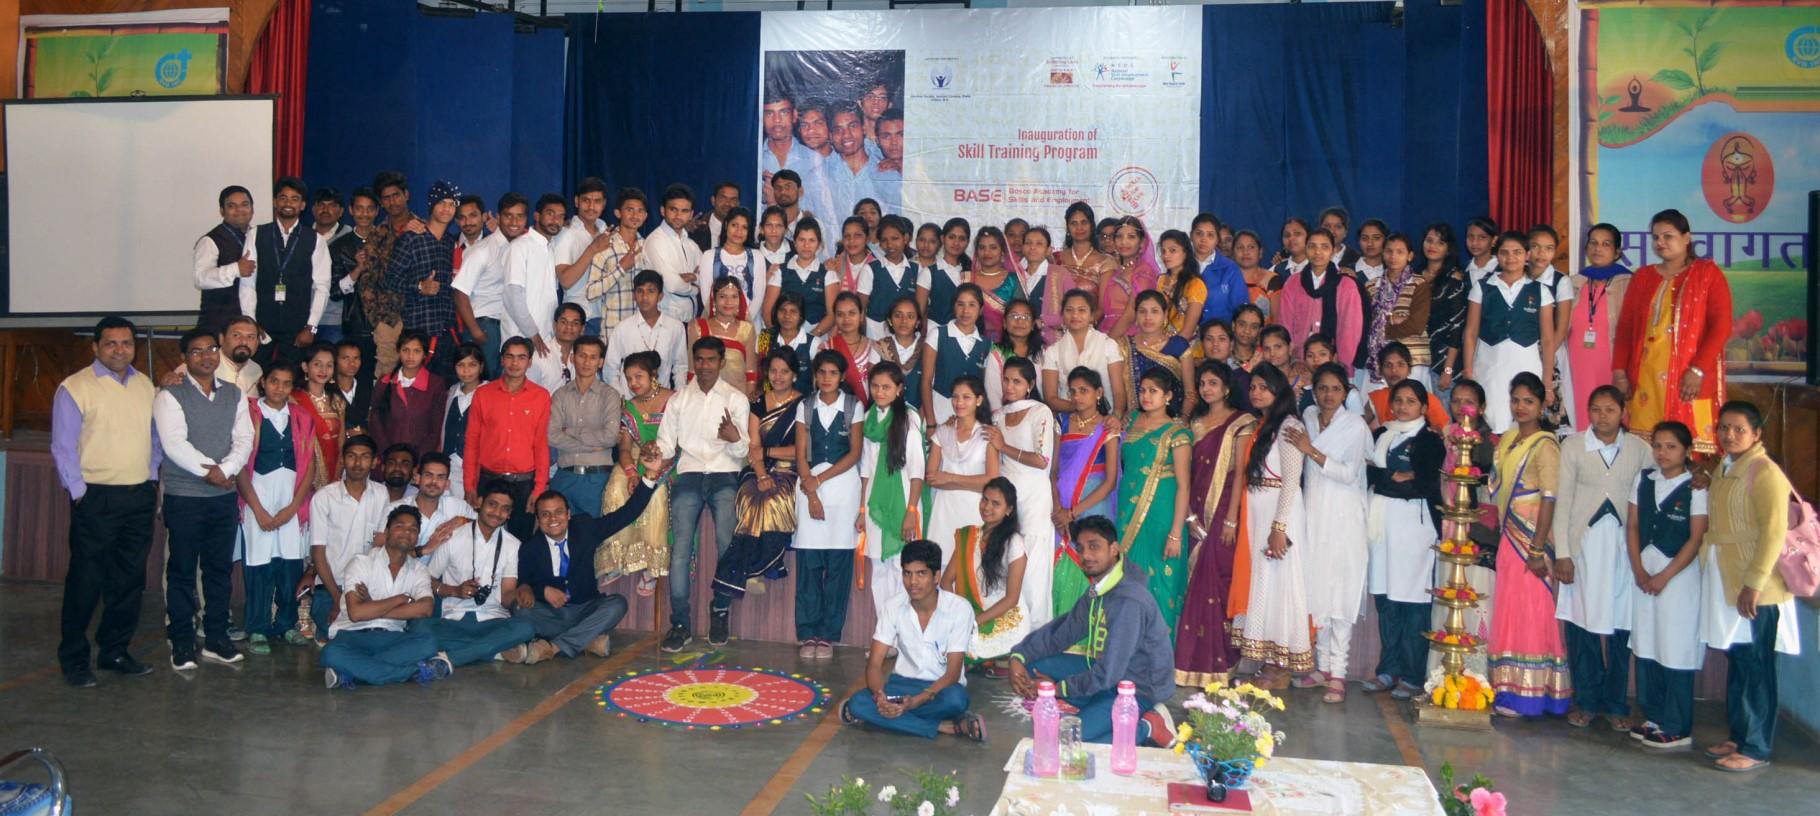 Inauguration: 2nd Batch of Skill Training Program